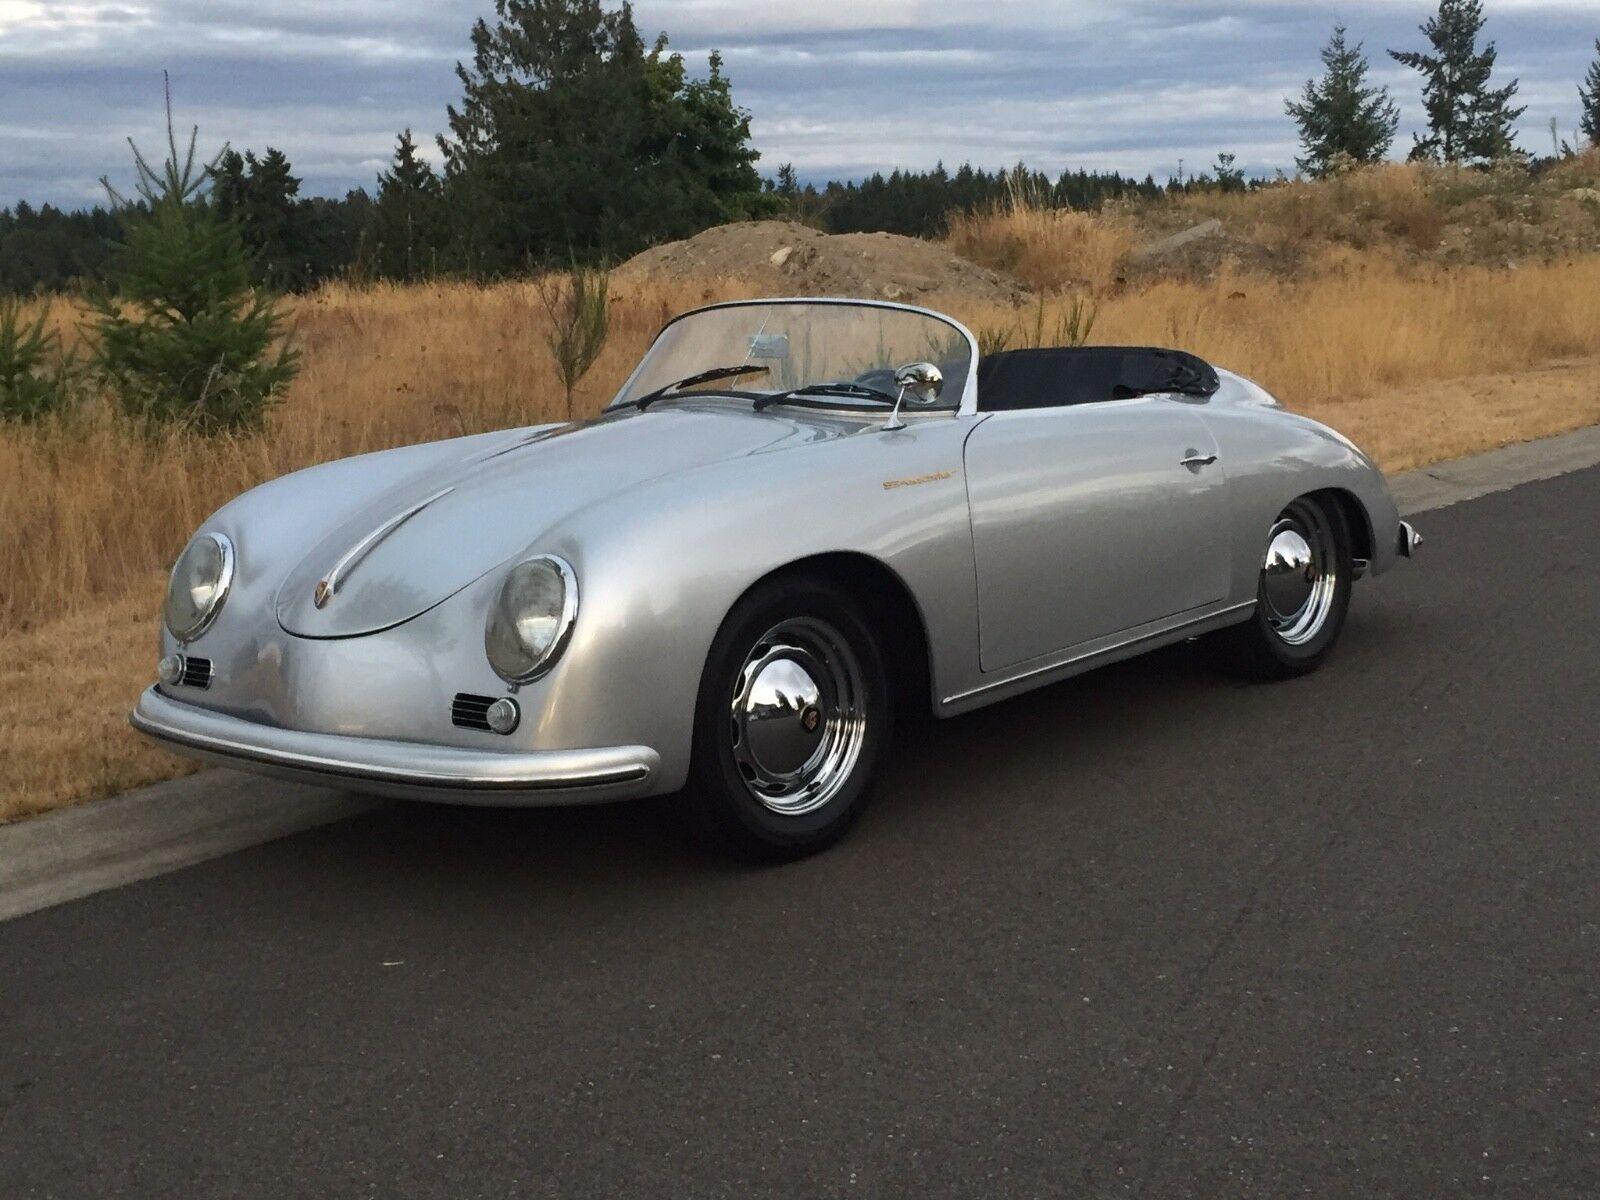 1957 Porsche 356 Speedster 1957 Porsche 356 Speedster